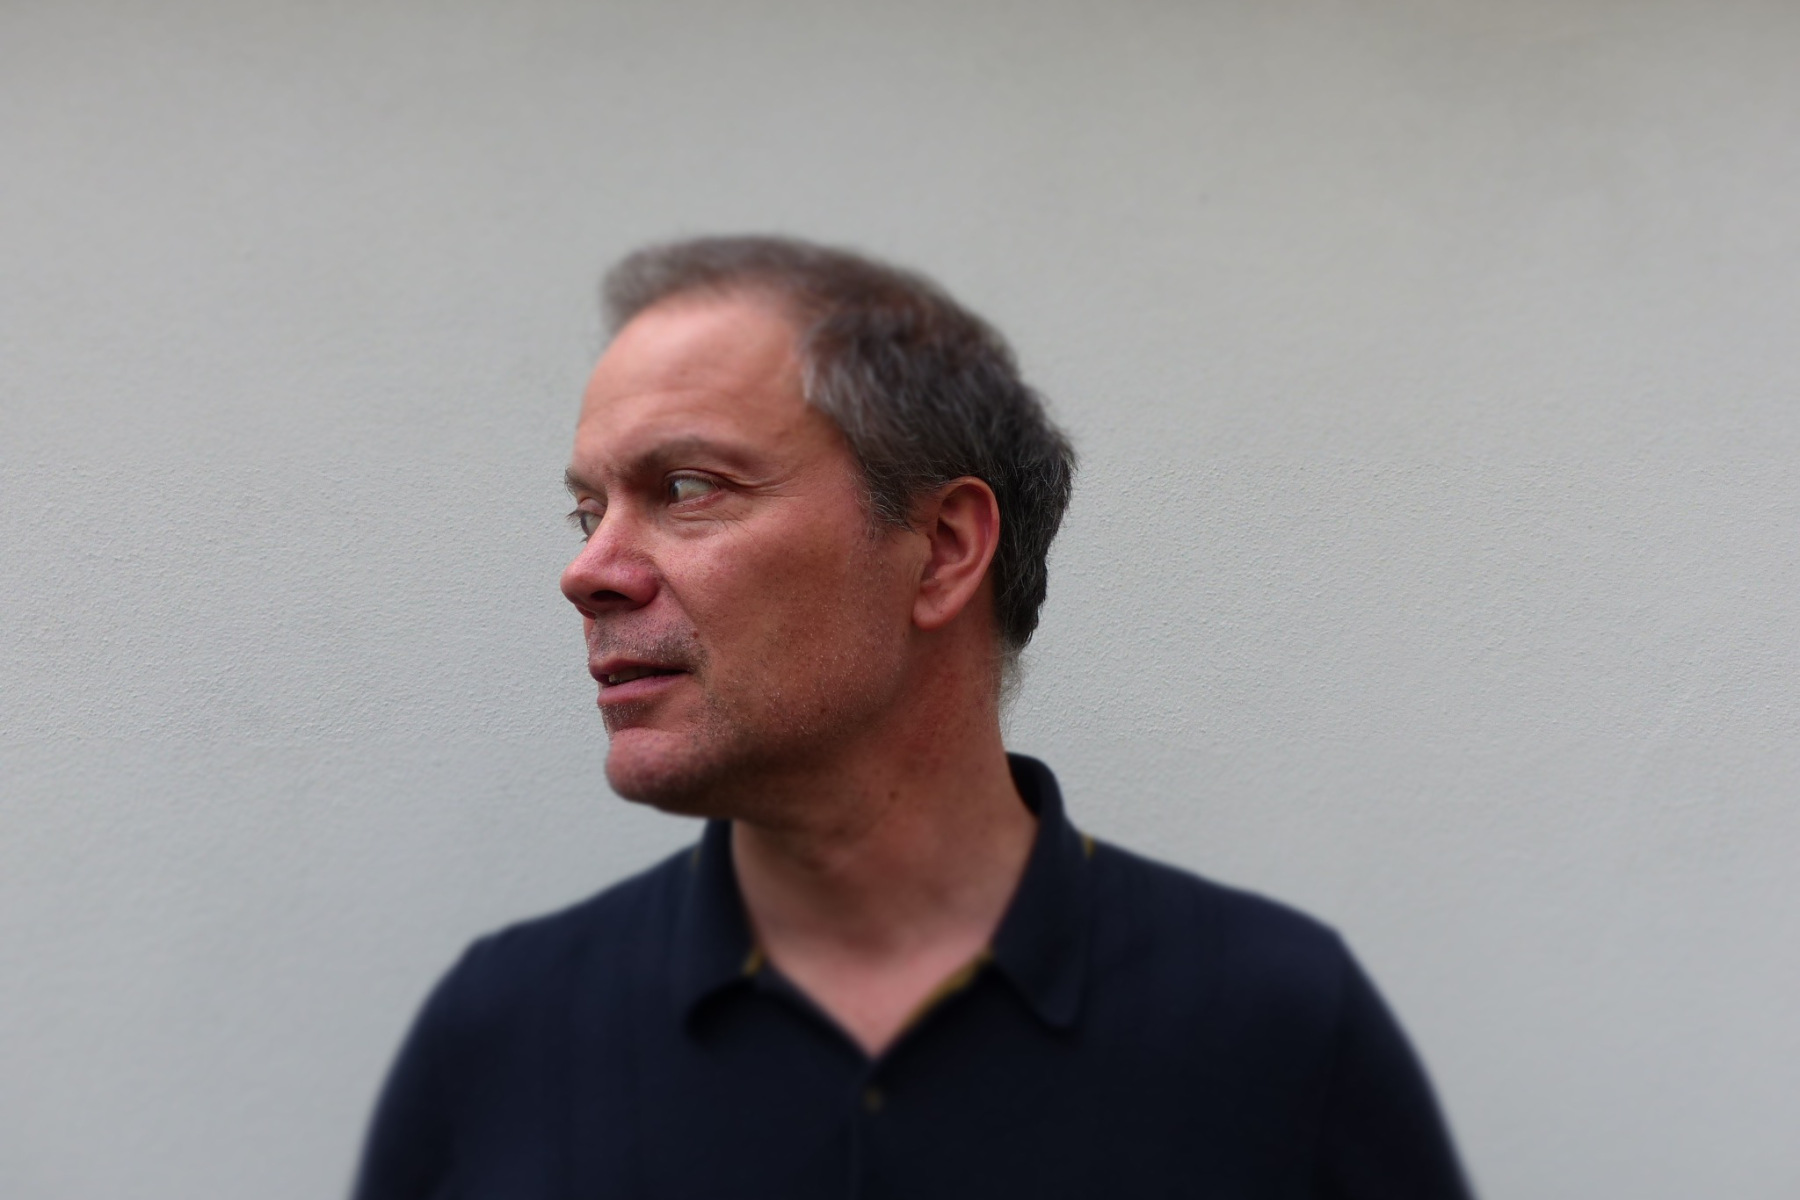 Jamie Vartan portrait photo-1.jpg